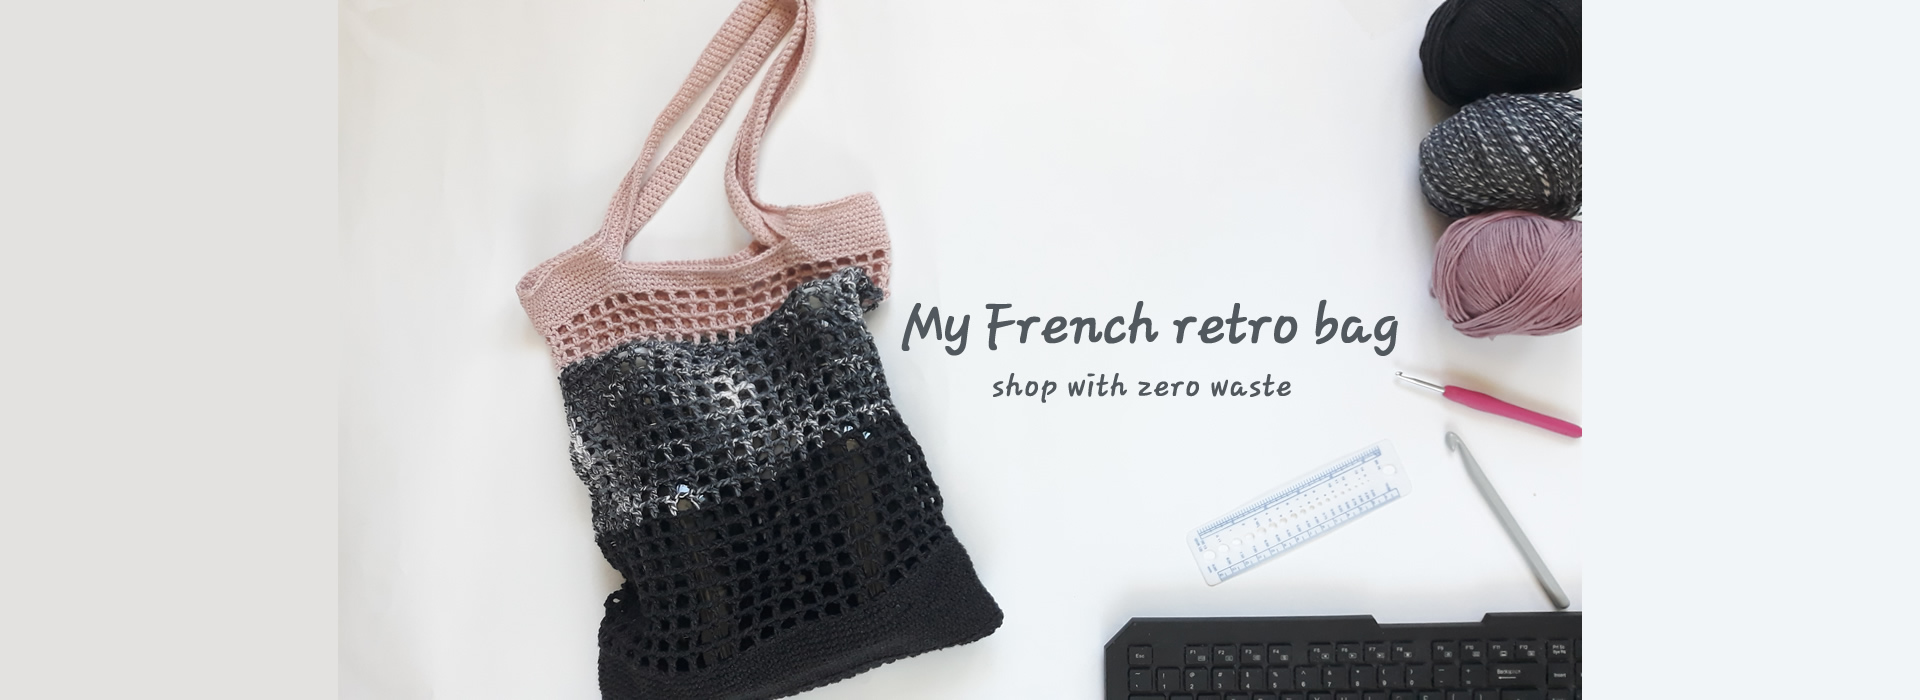 Portobelloknit French retro bag